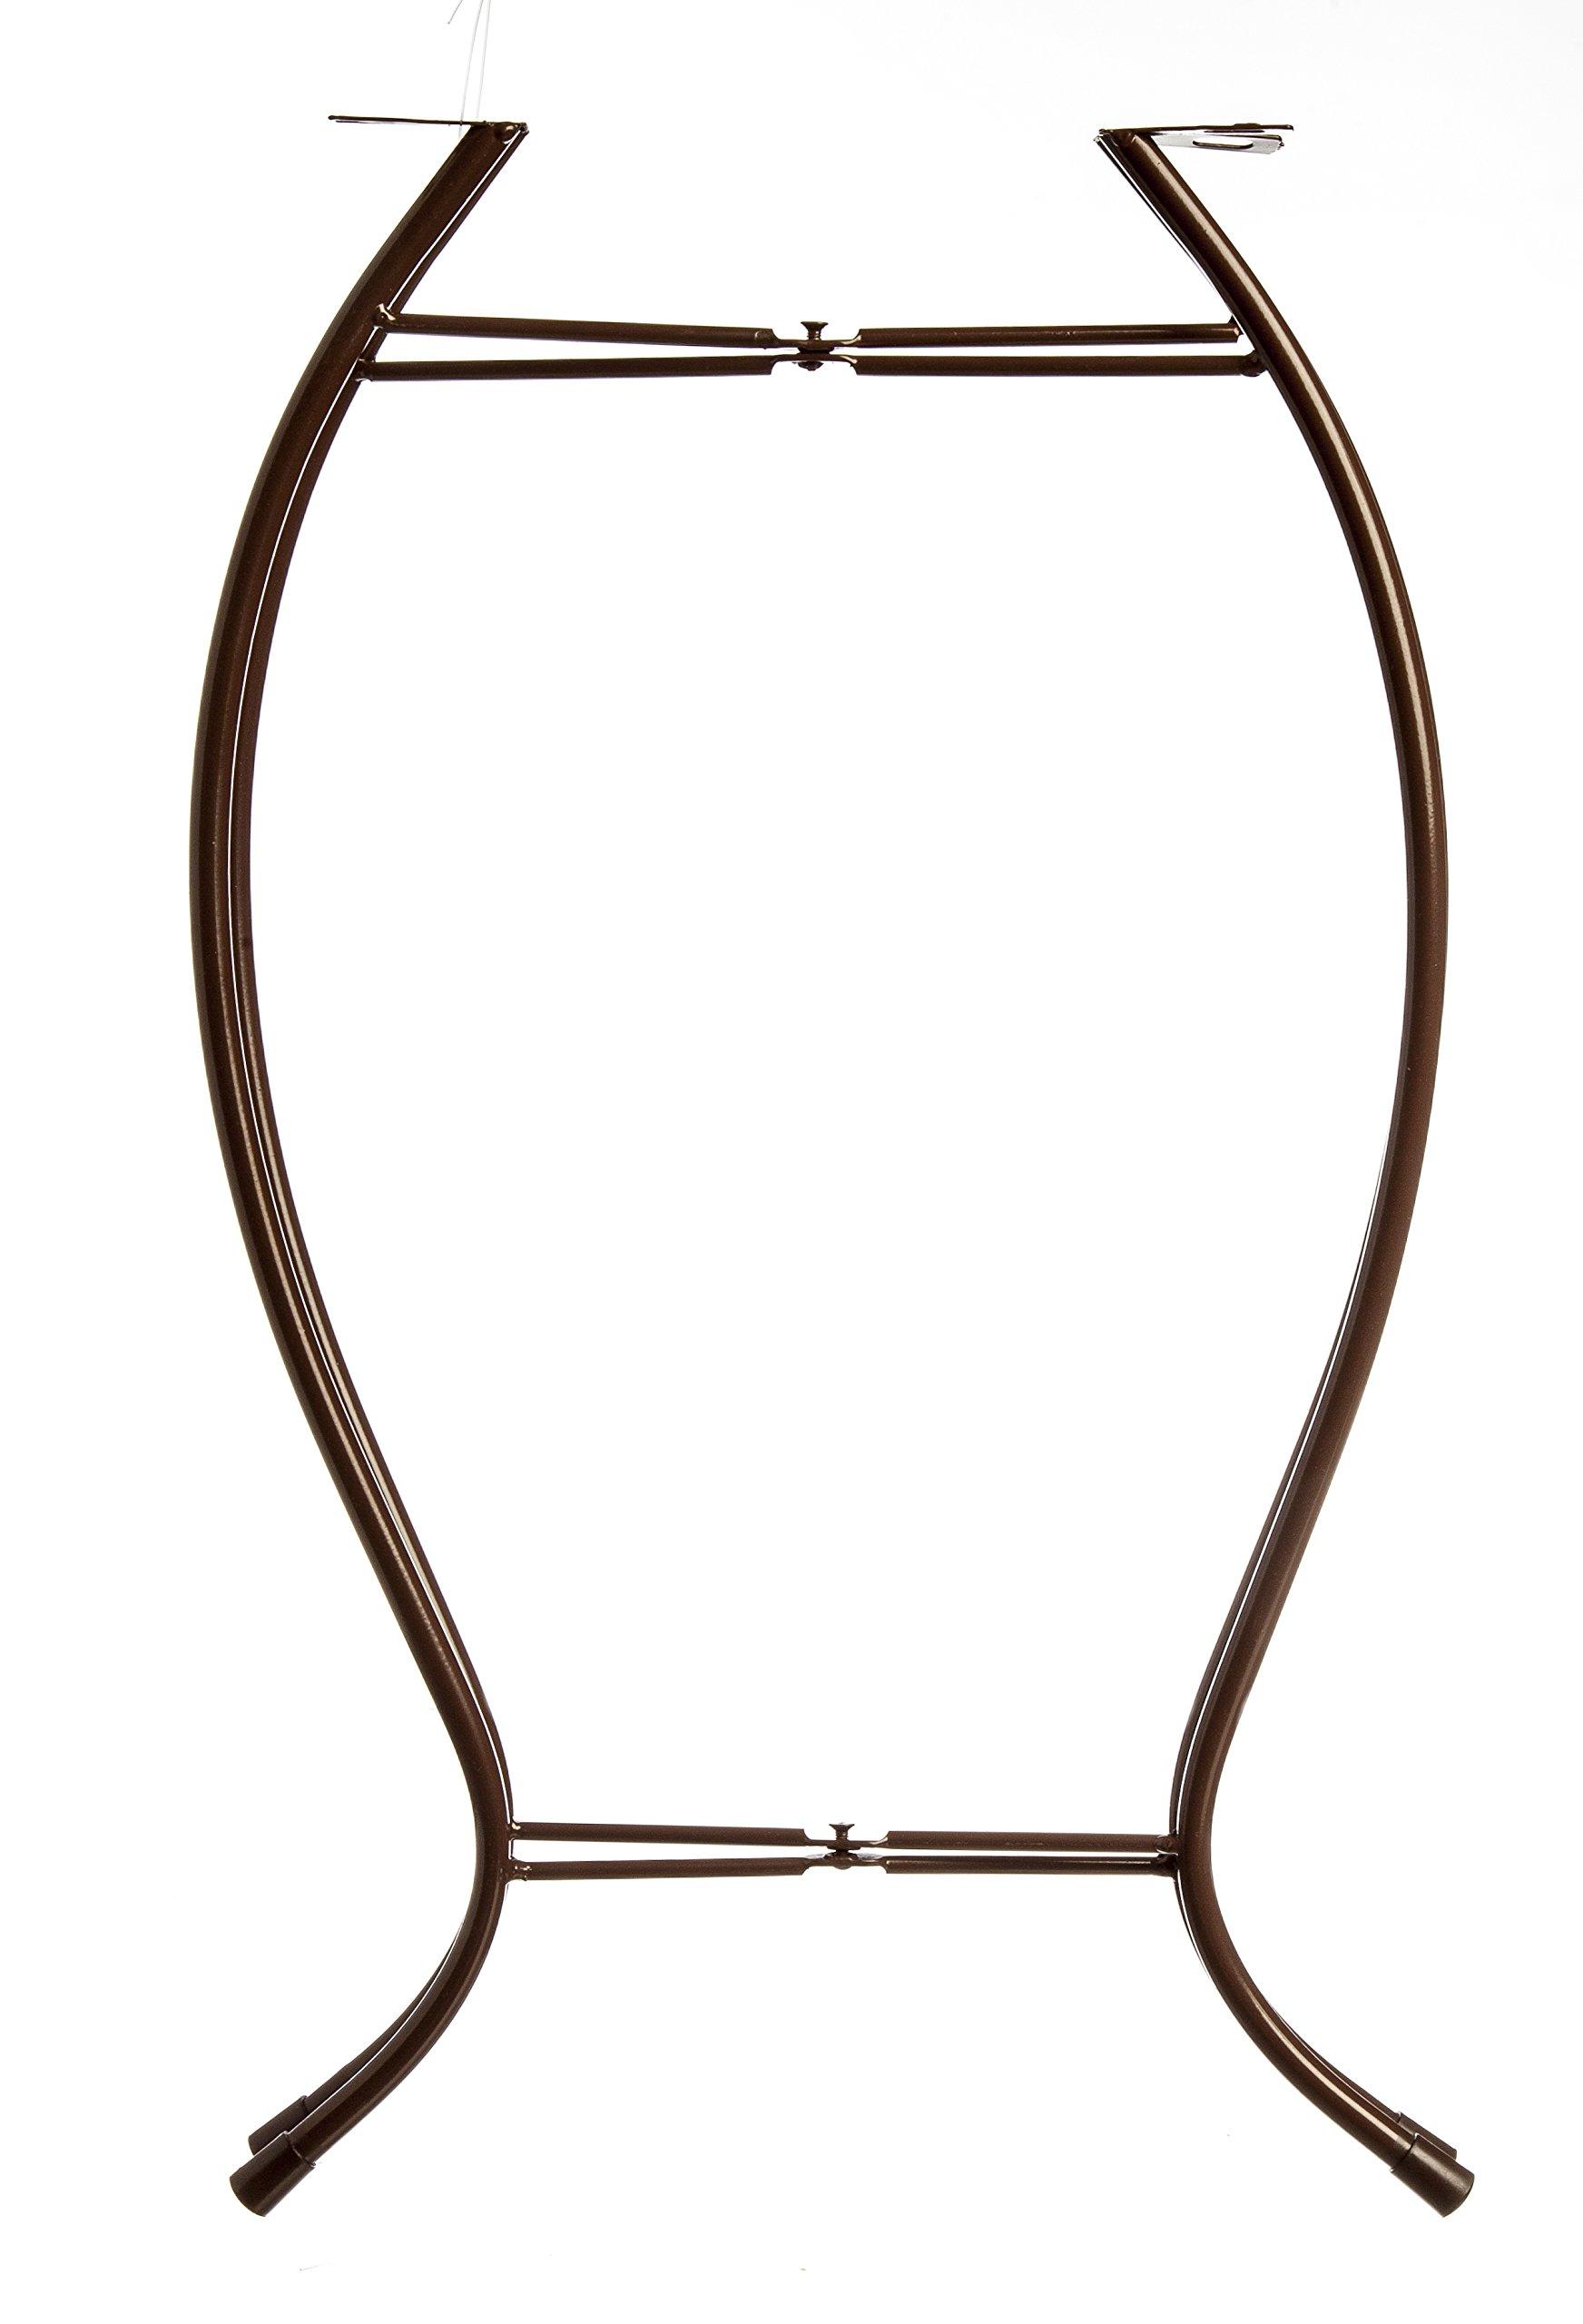 Evergreen Garden Outdoor-Safe Round Summer Splash Glass and Metal Side Table - 12''L x 12''W x 22''H